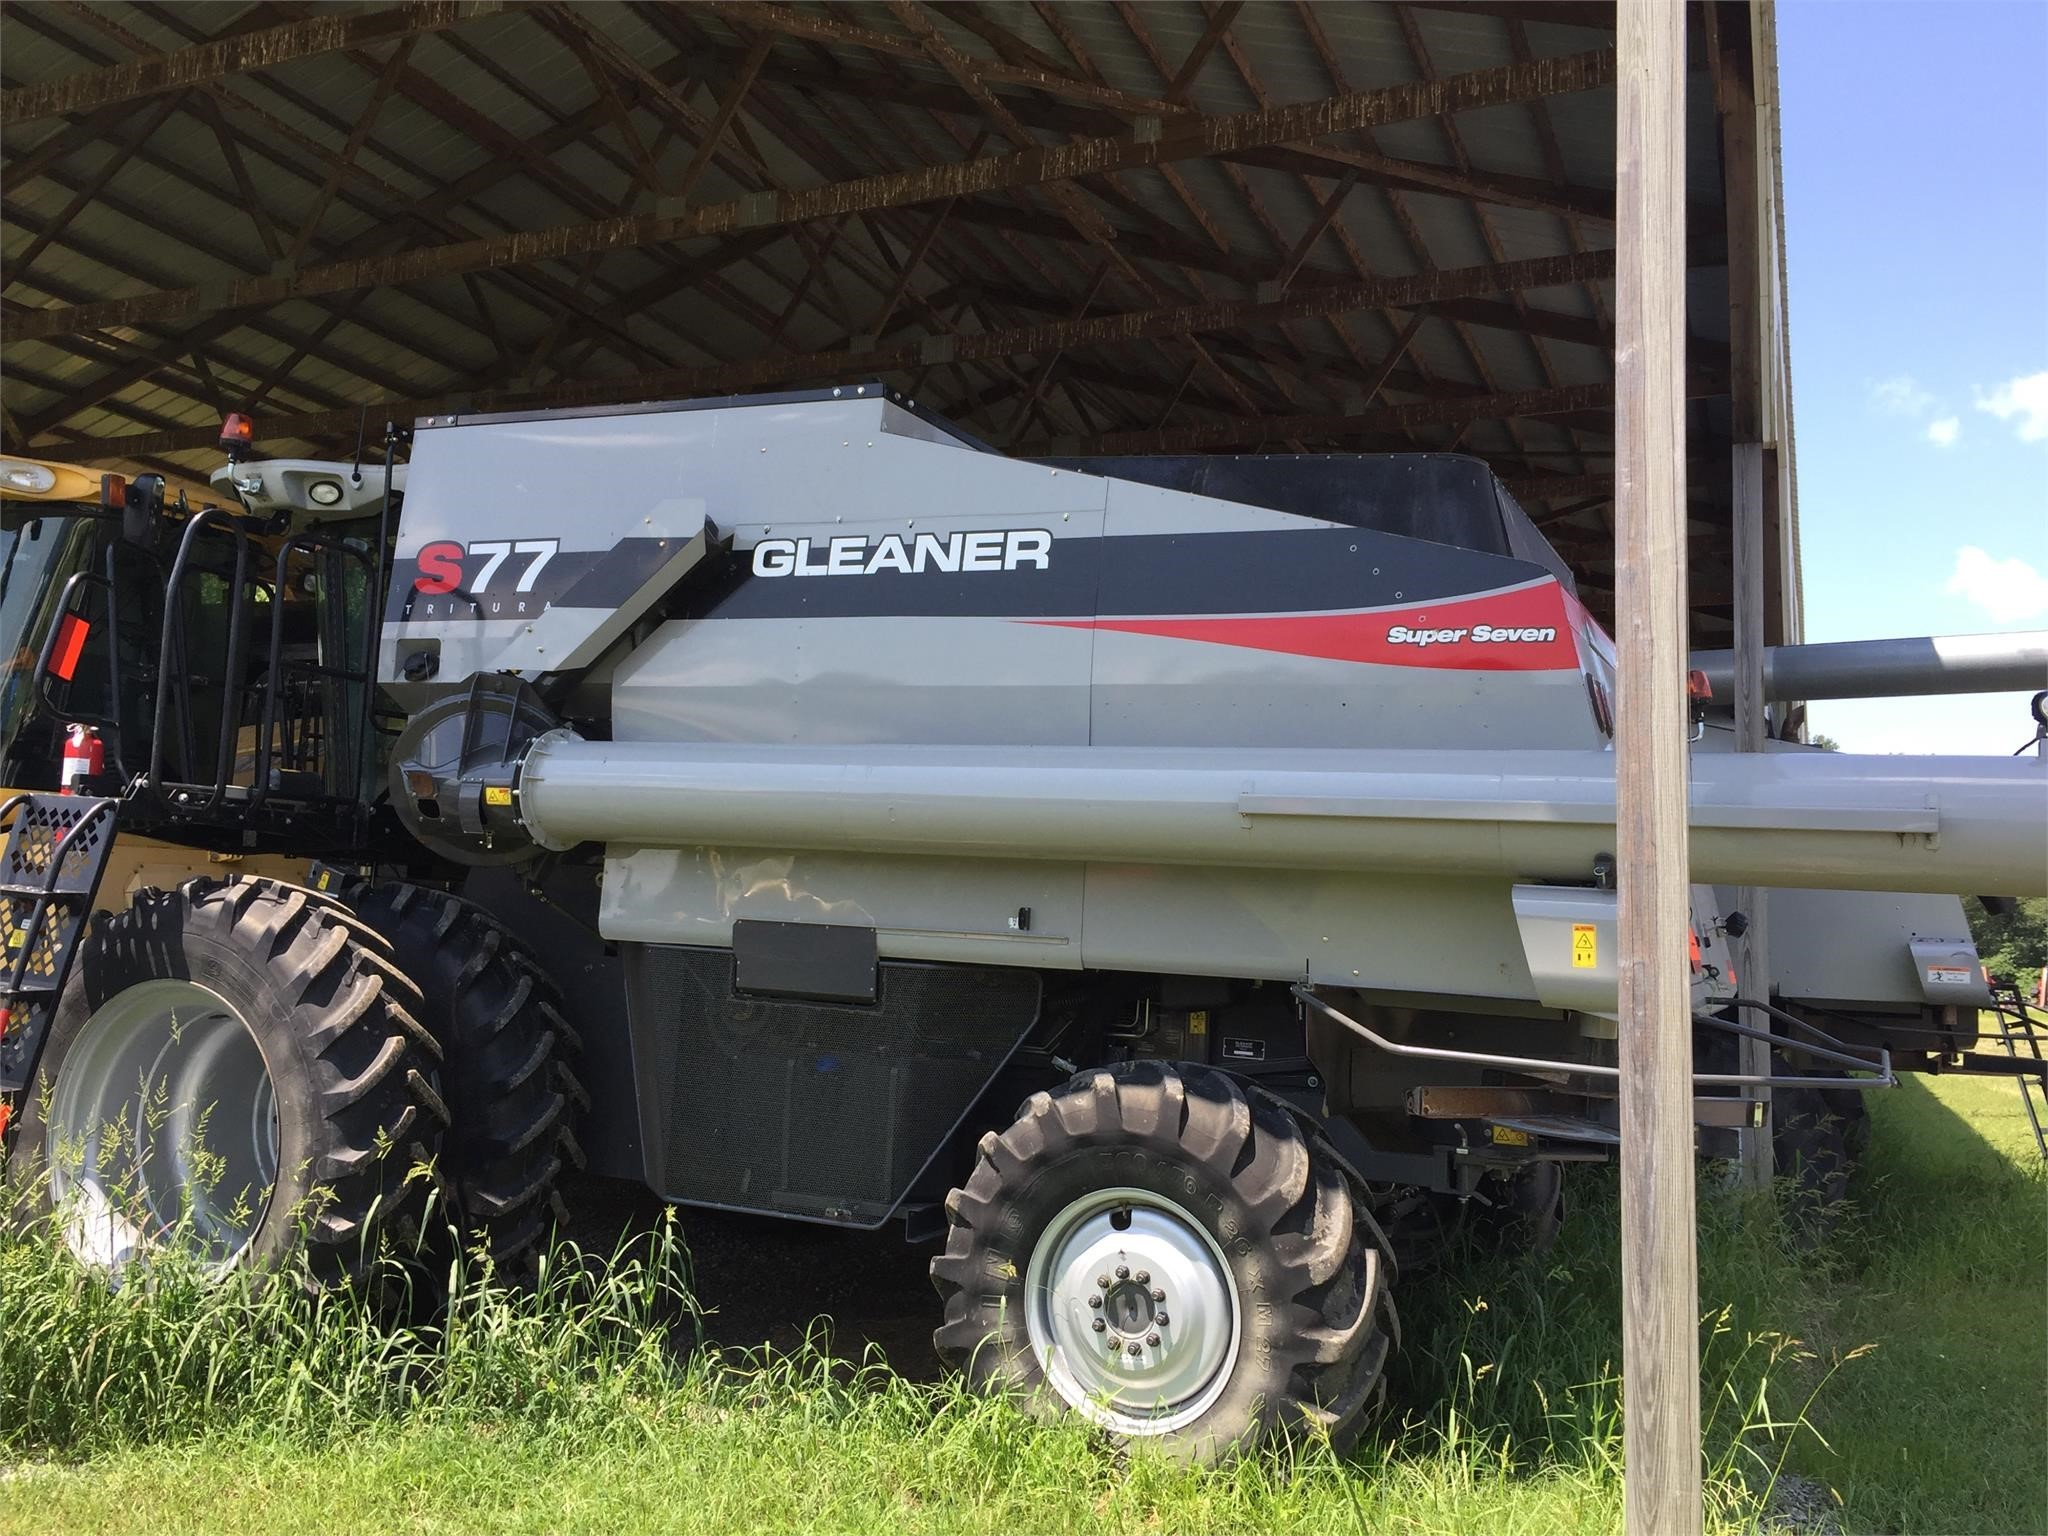 2014 Gleaner S77 Combine